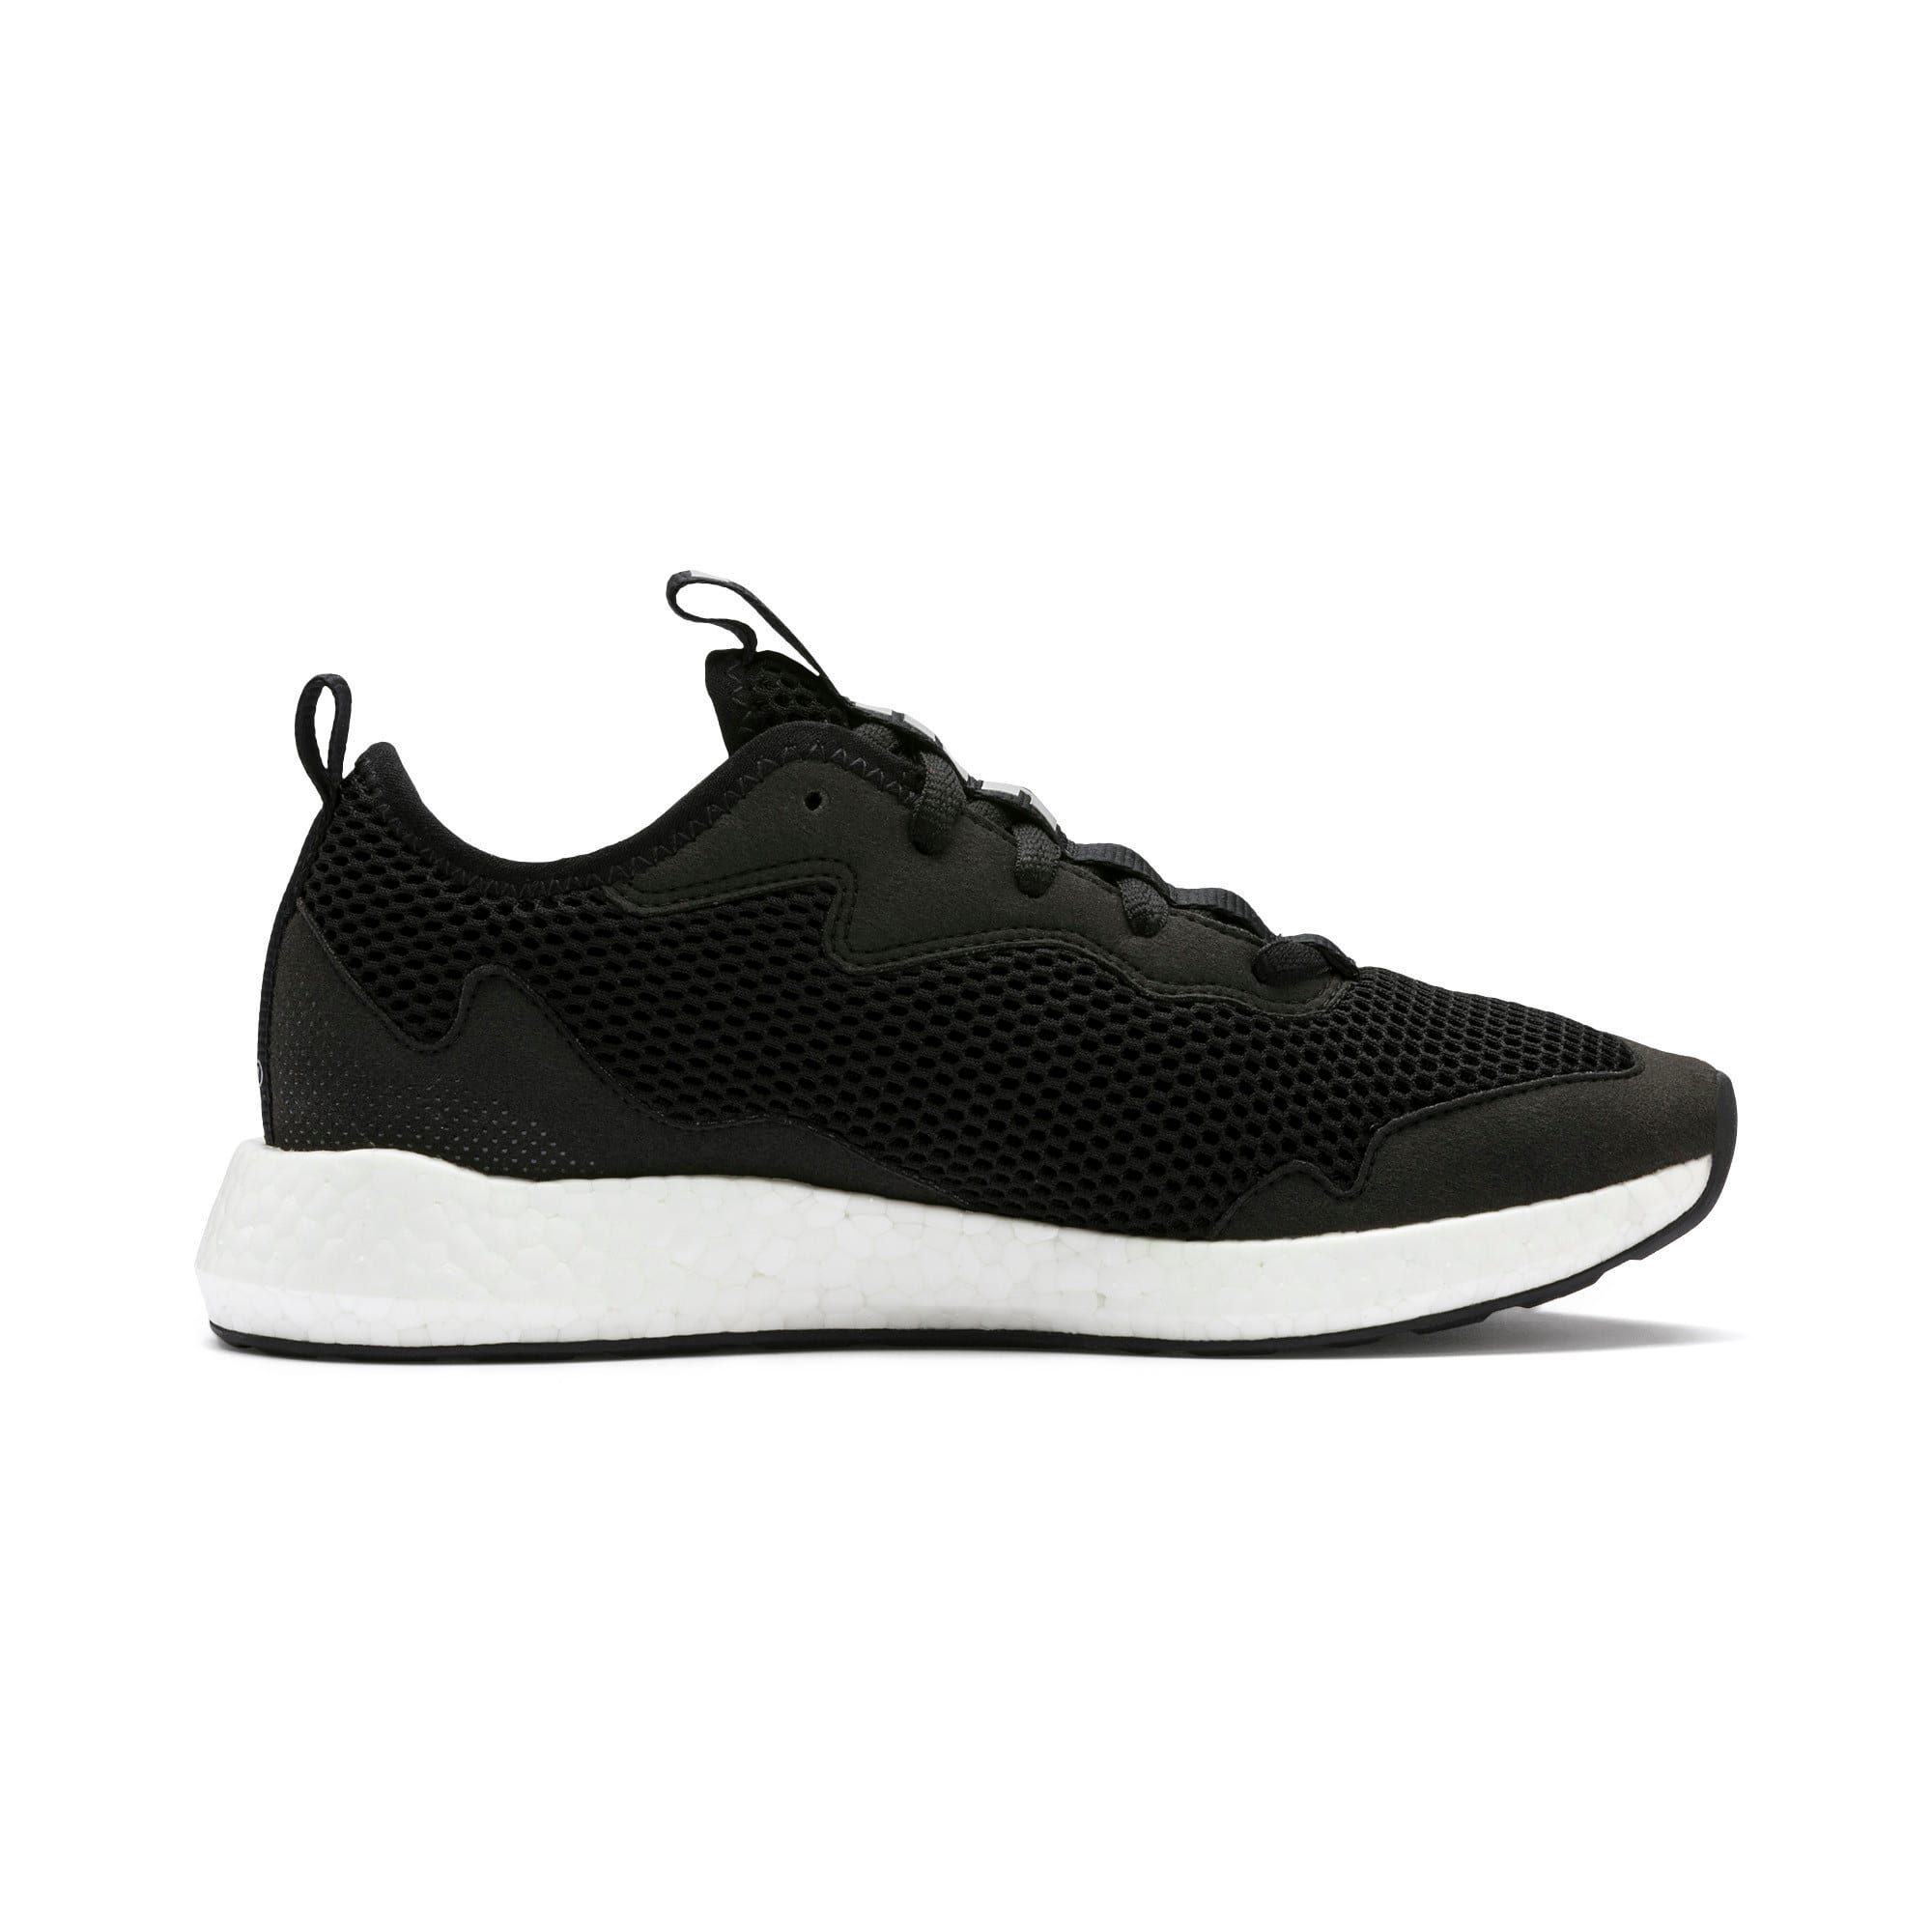 Thumbnail 5 of NRGY Neko Skim Women's Running Shoes, Puma Black-Puma Silver, medium-IND